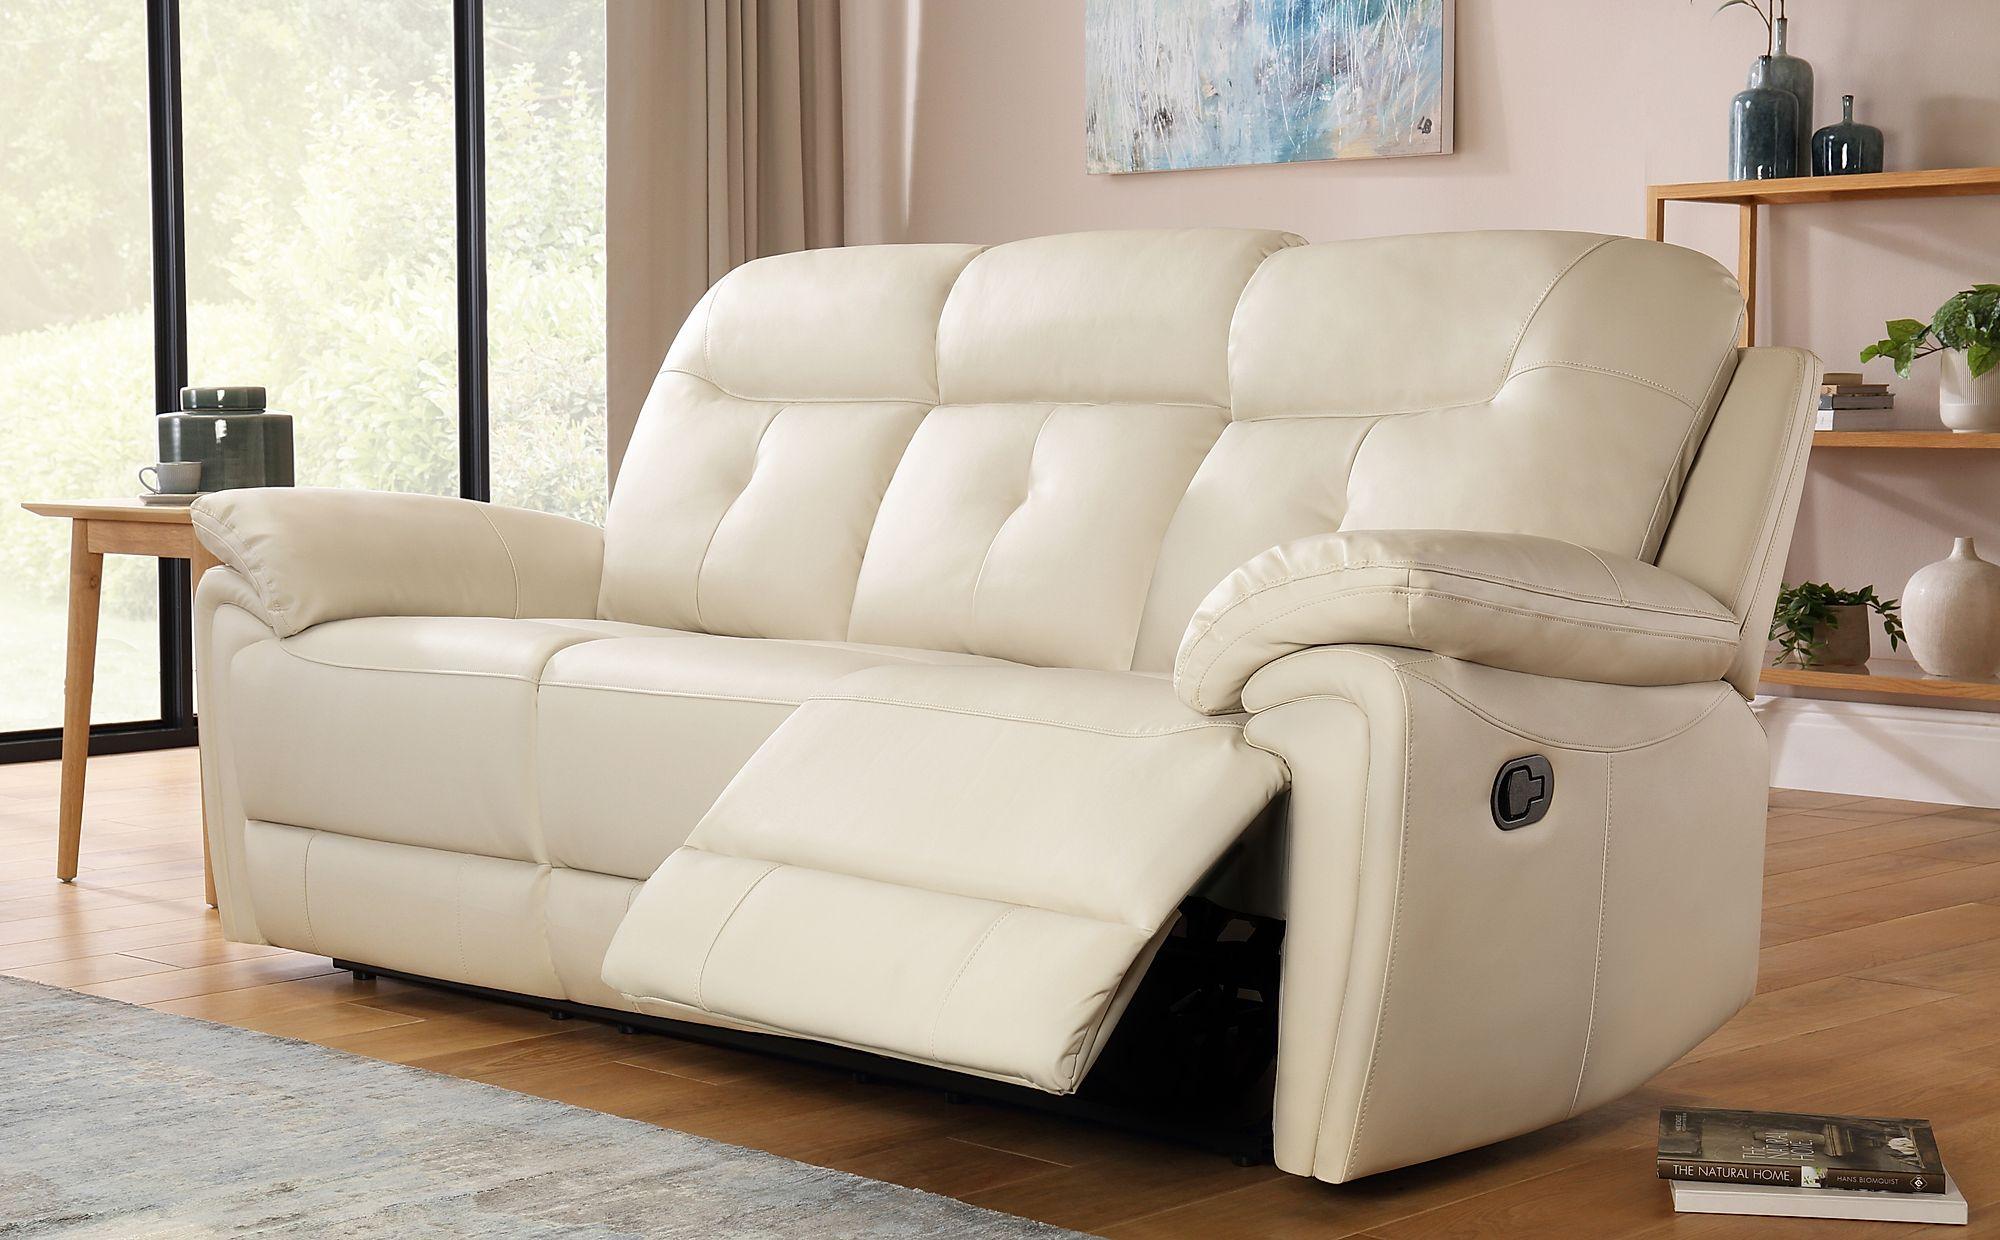 Ellington Ivory Leather 3 Seater Recliner Sofa Furniture